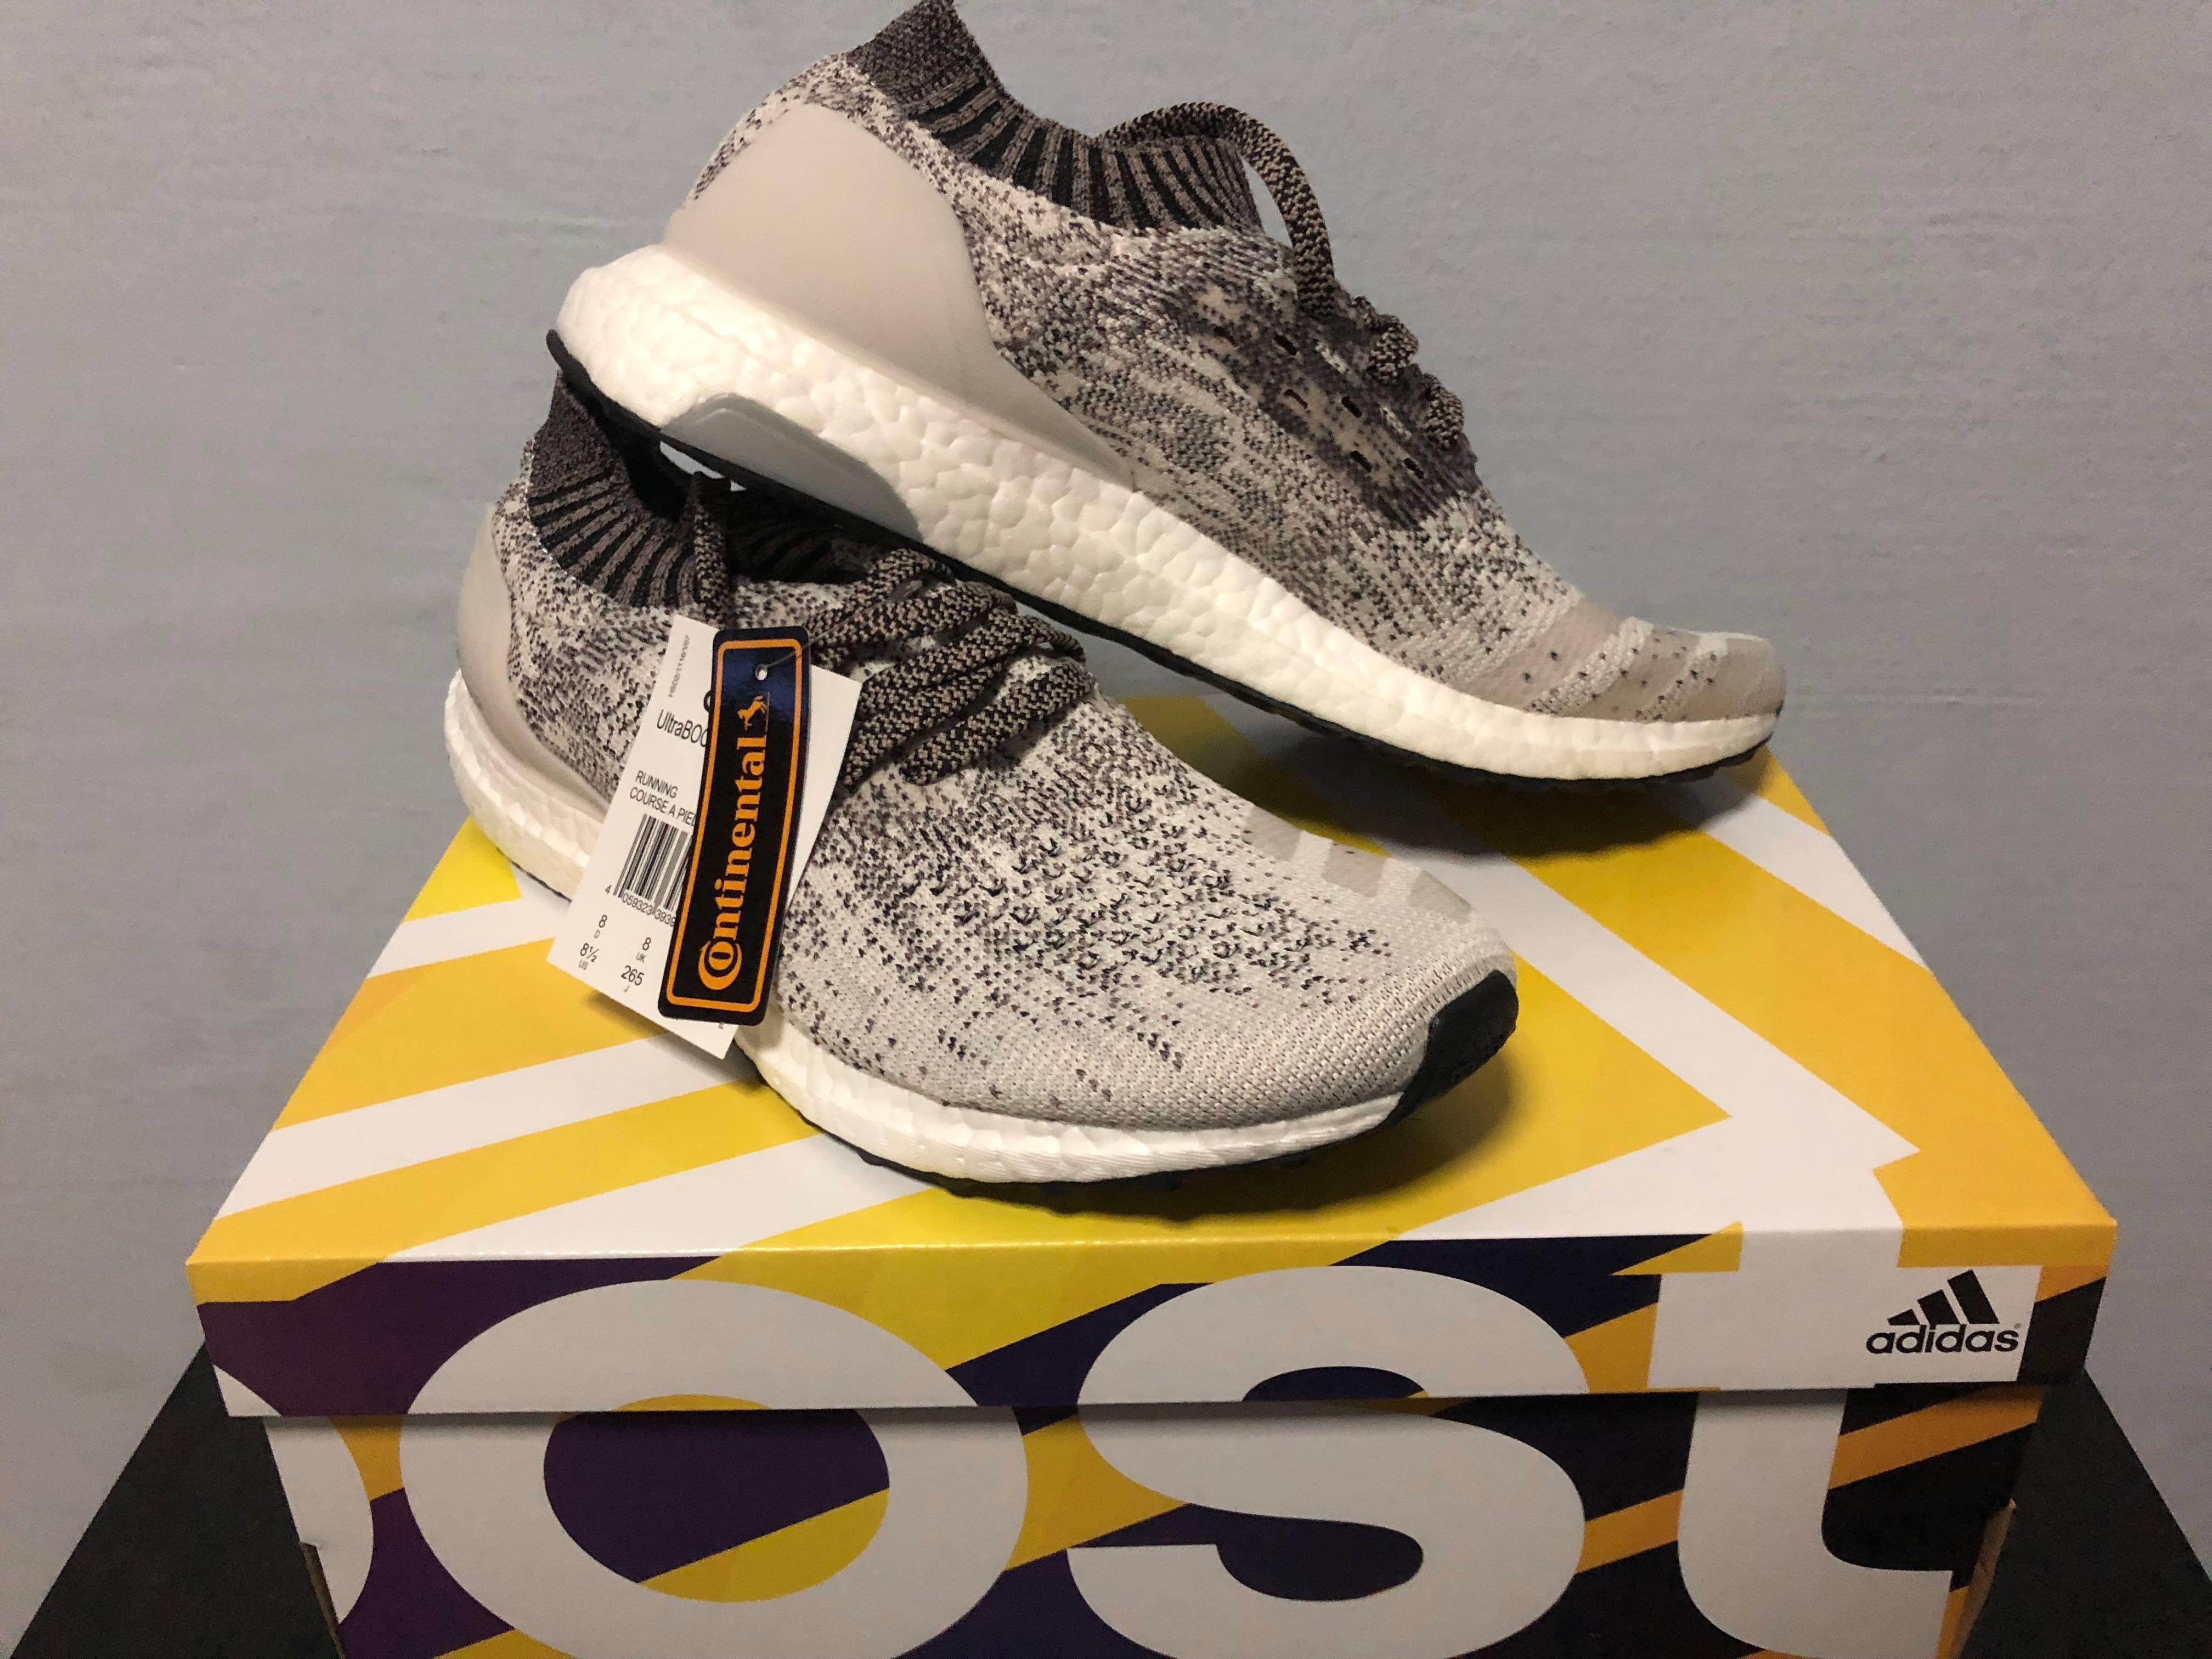 722110f2878 Adidas Ultraboost Uncaged